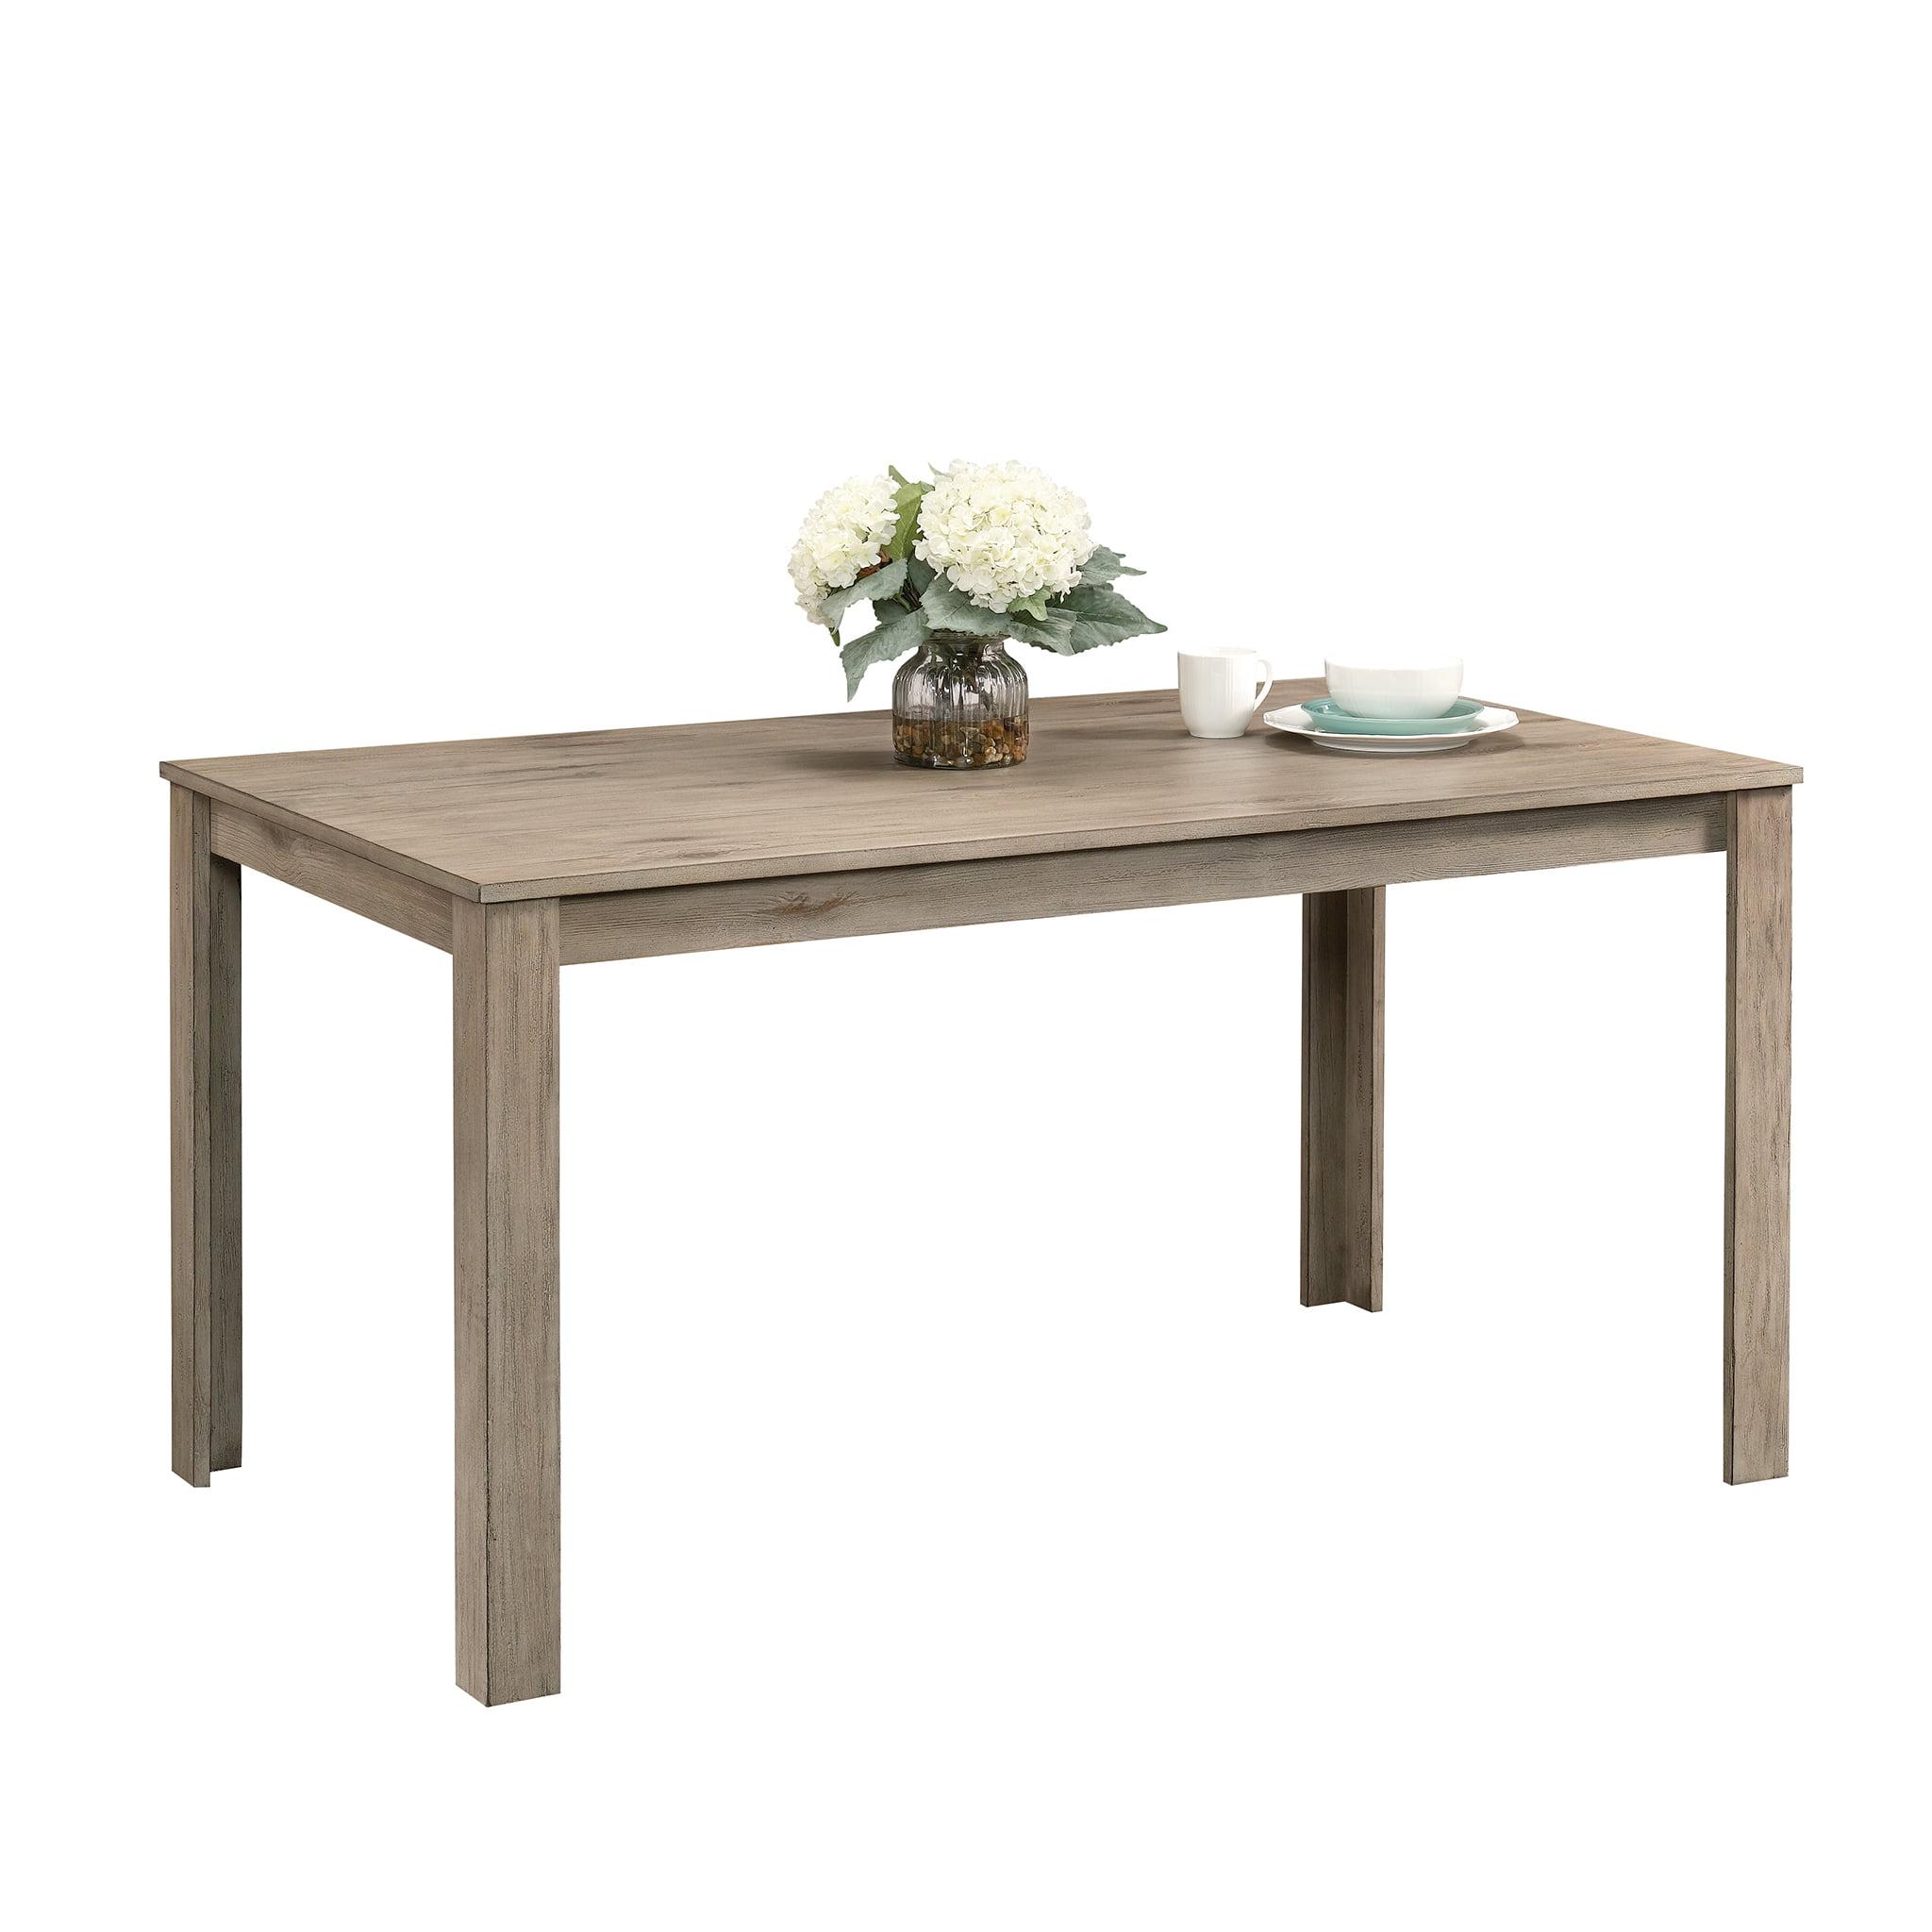 Sauder New Grange Modern Farmhouse Dining Table White Pine Finish